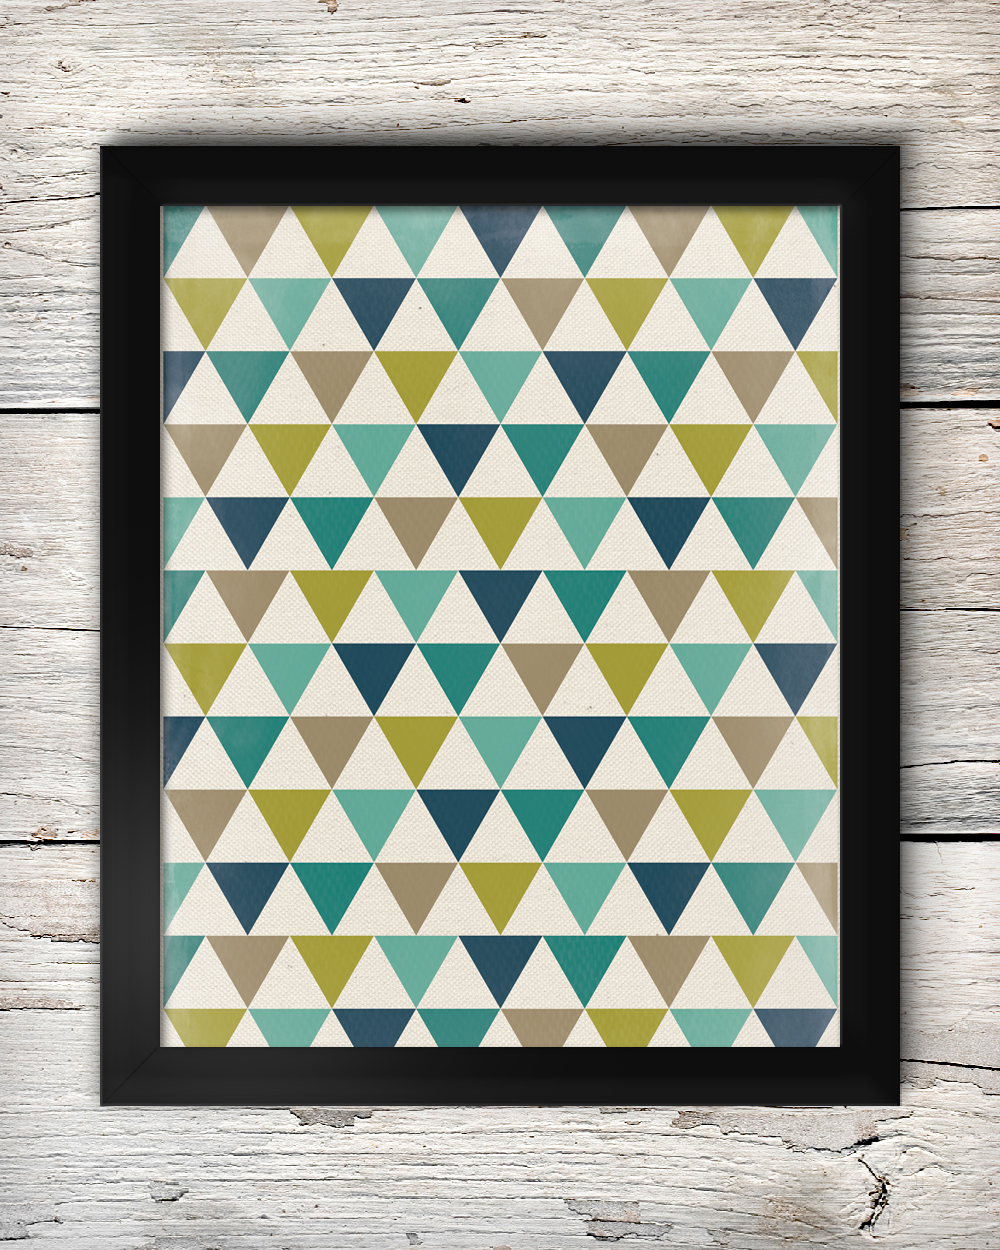 Free Teal, Navy, Chartreuse Green & Grey Traingles Art Printable